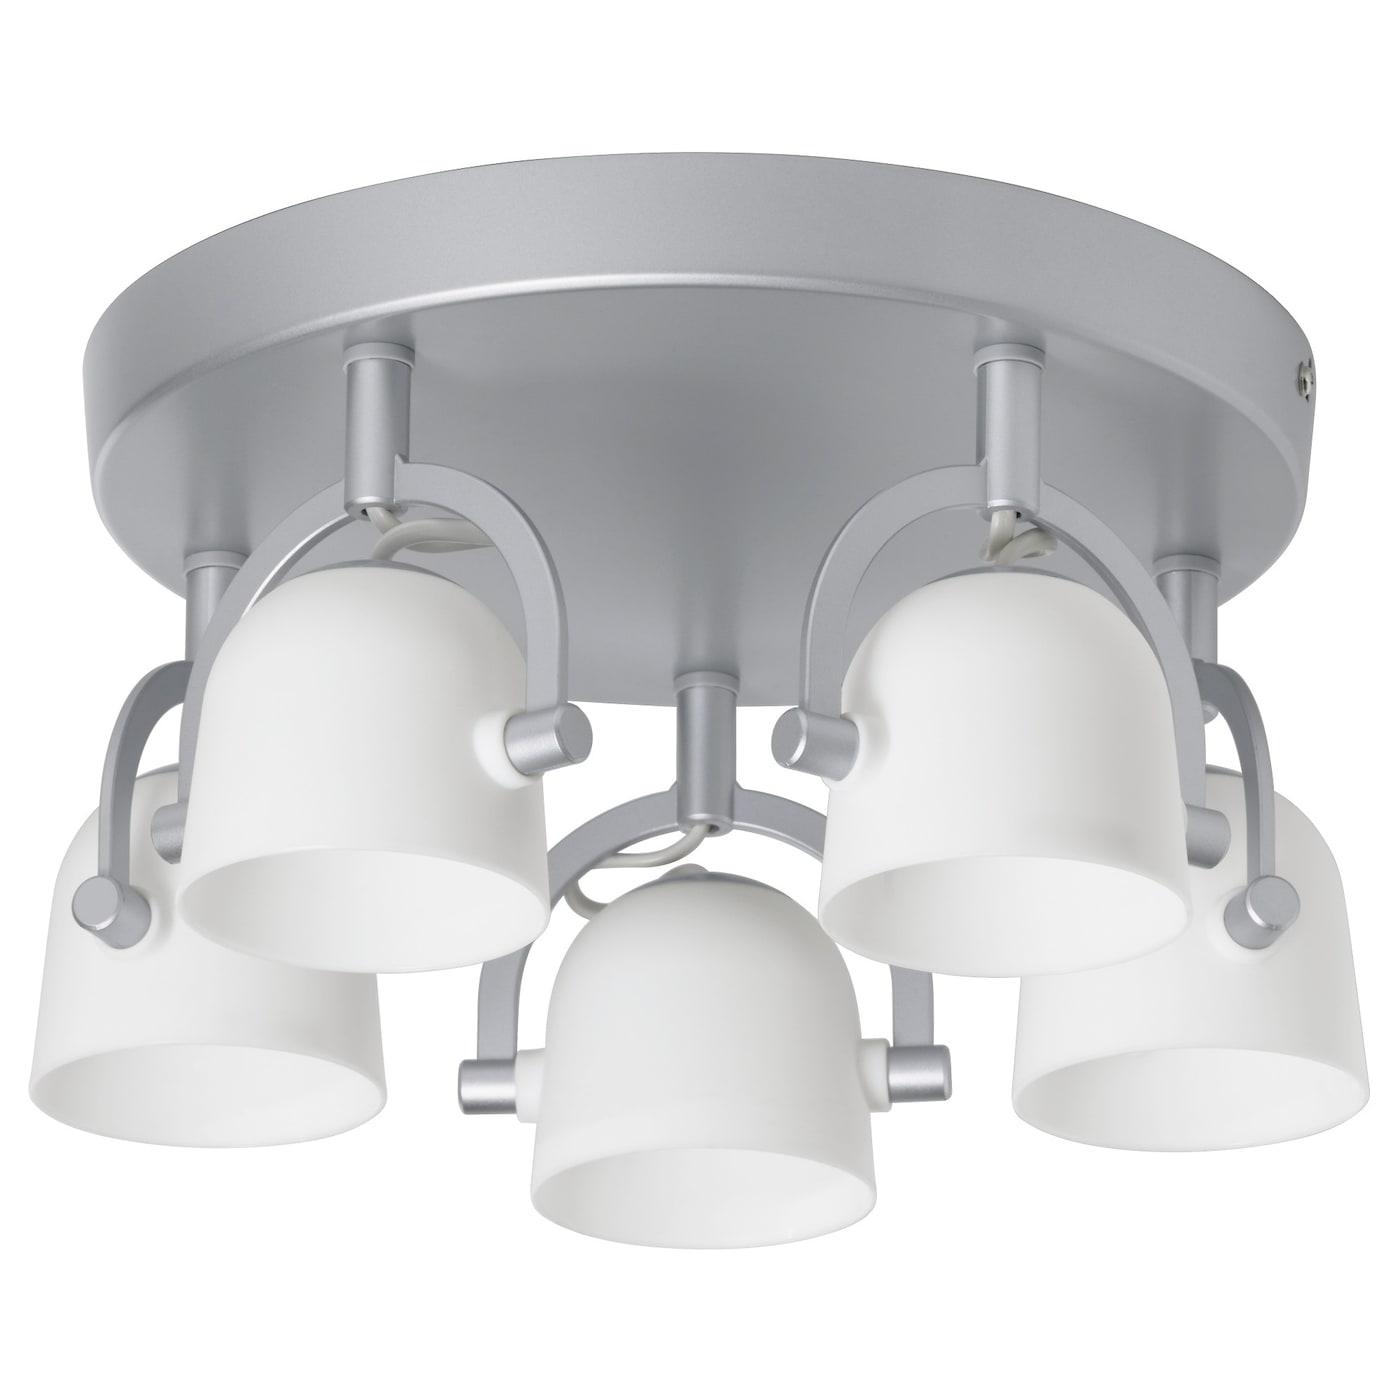 Directional ceiling lights uk hbm blog svirvel ceiling spotlight with 5 spots aloadofball Image collections